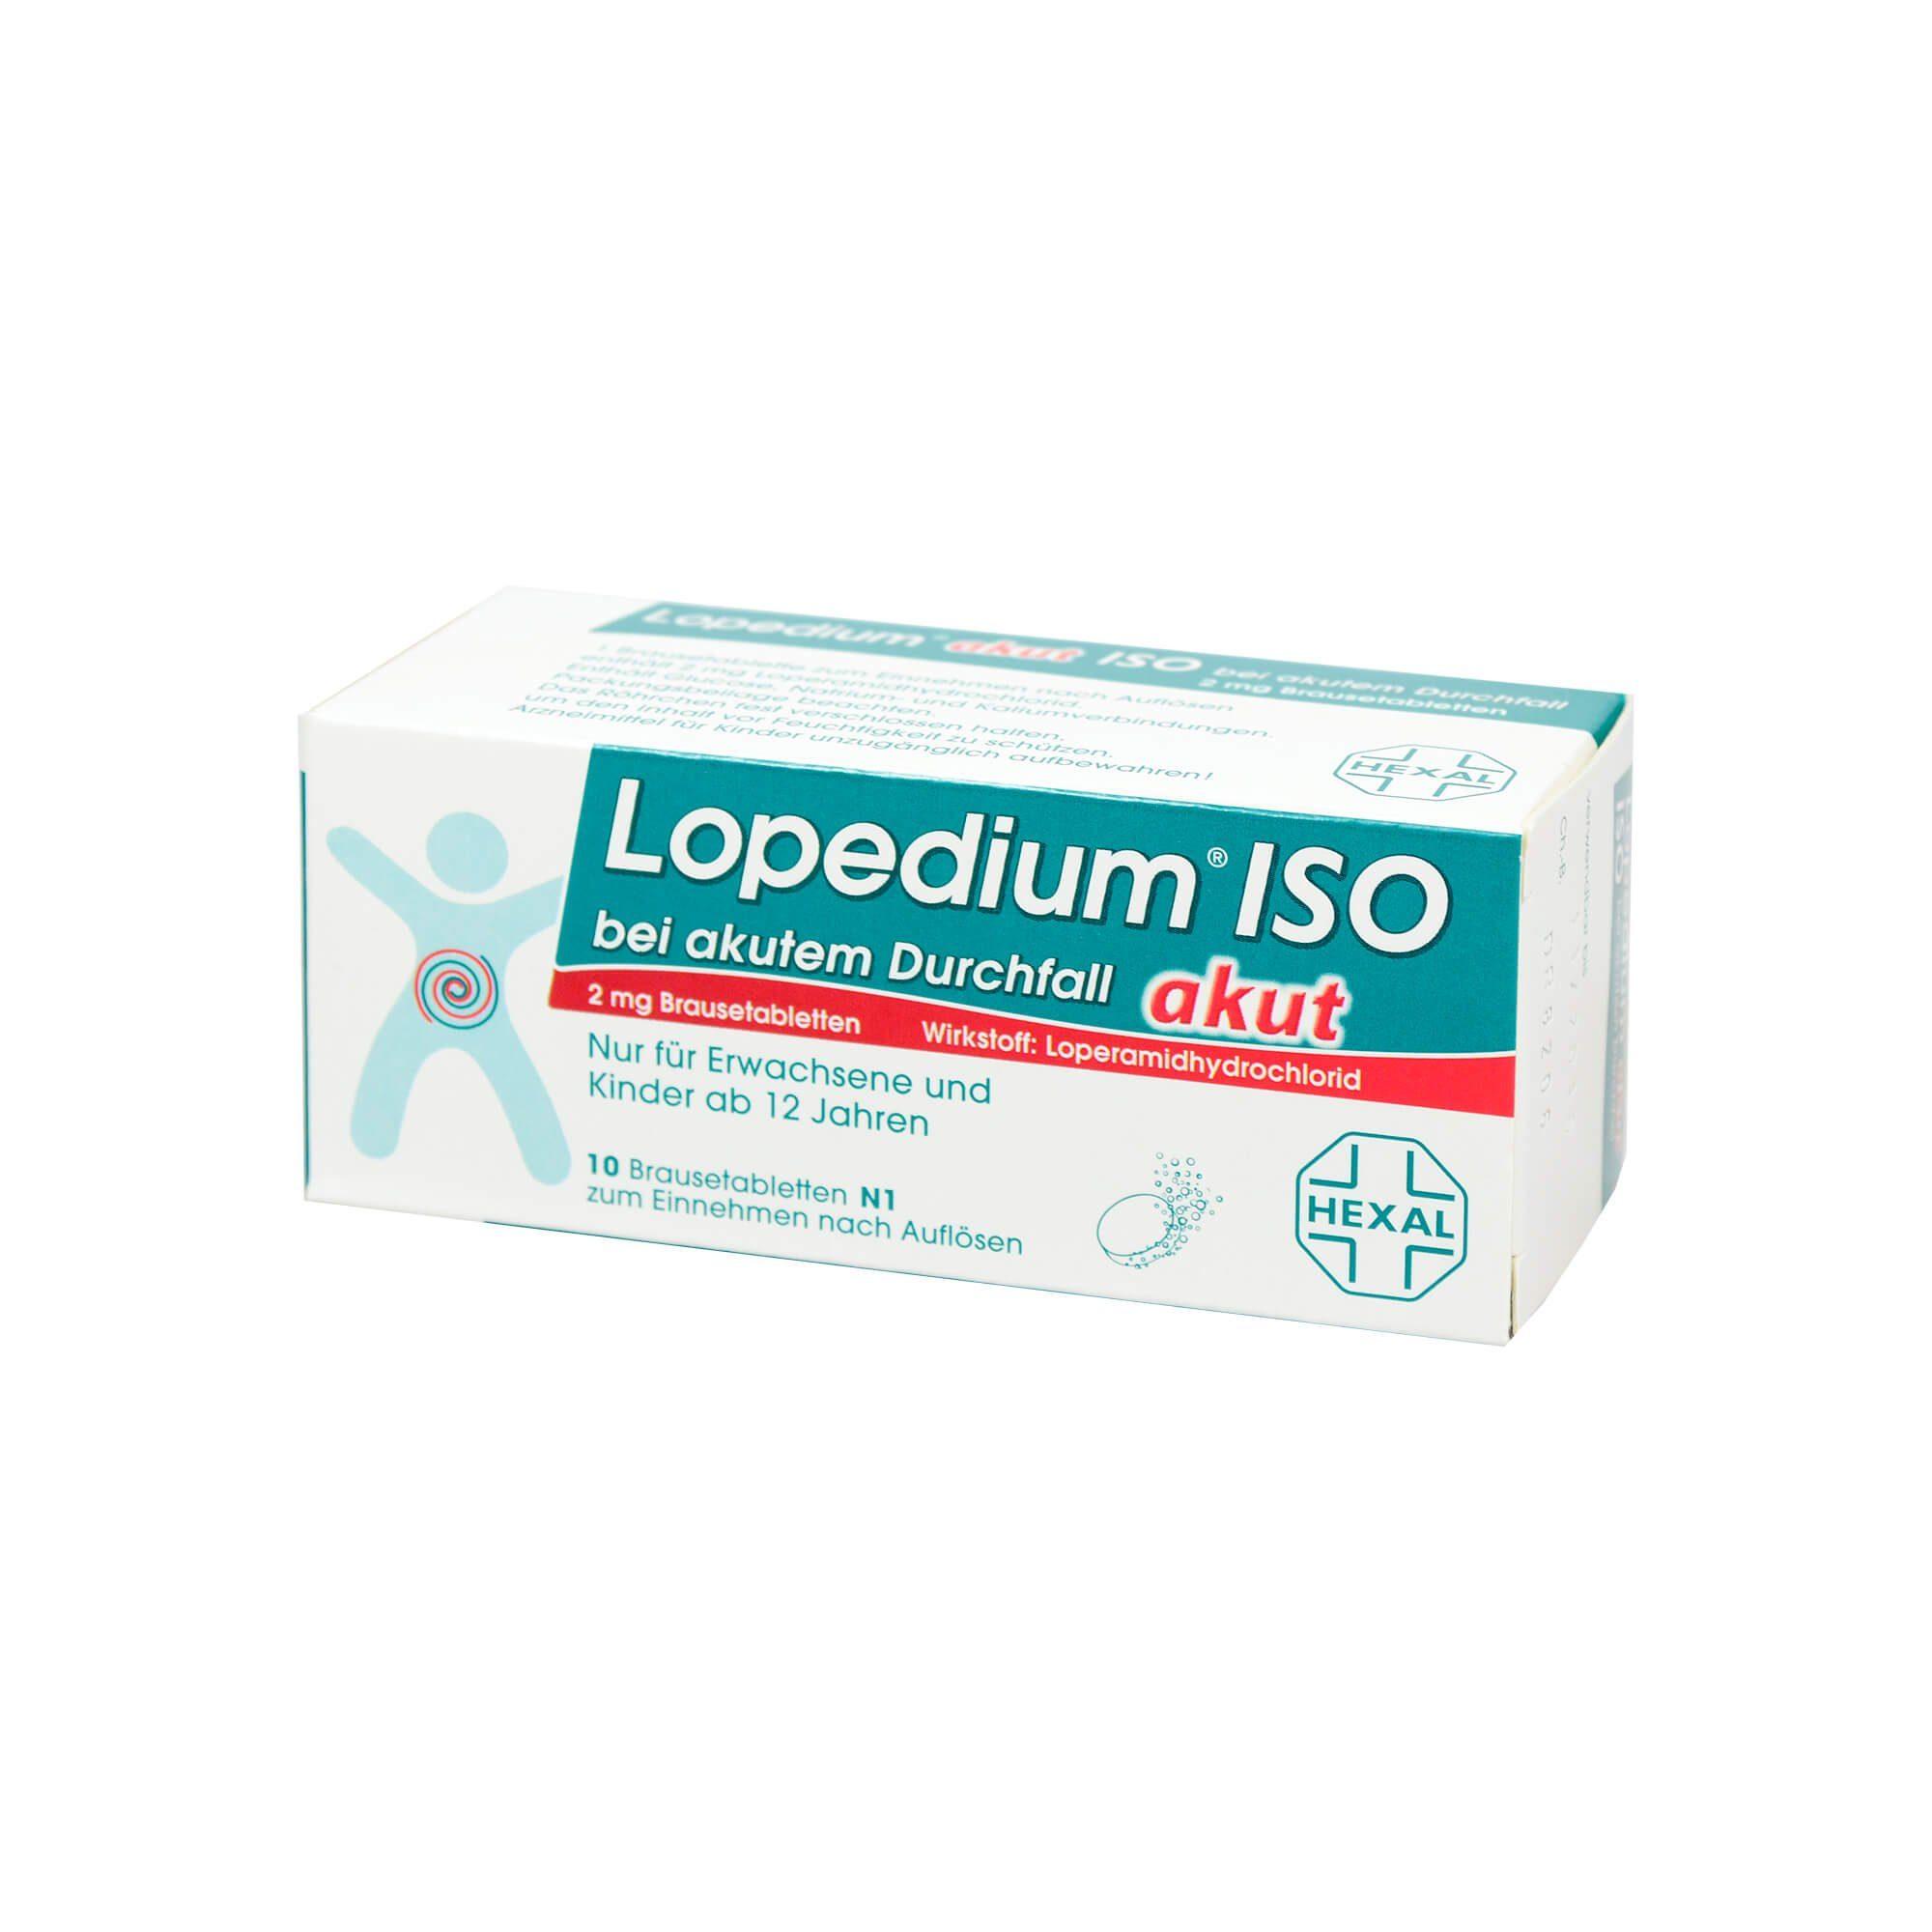 Lopedium akut ISO bei akutem Durchfall Brausetabletten , 10 St